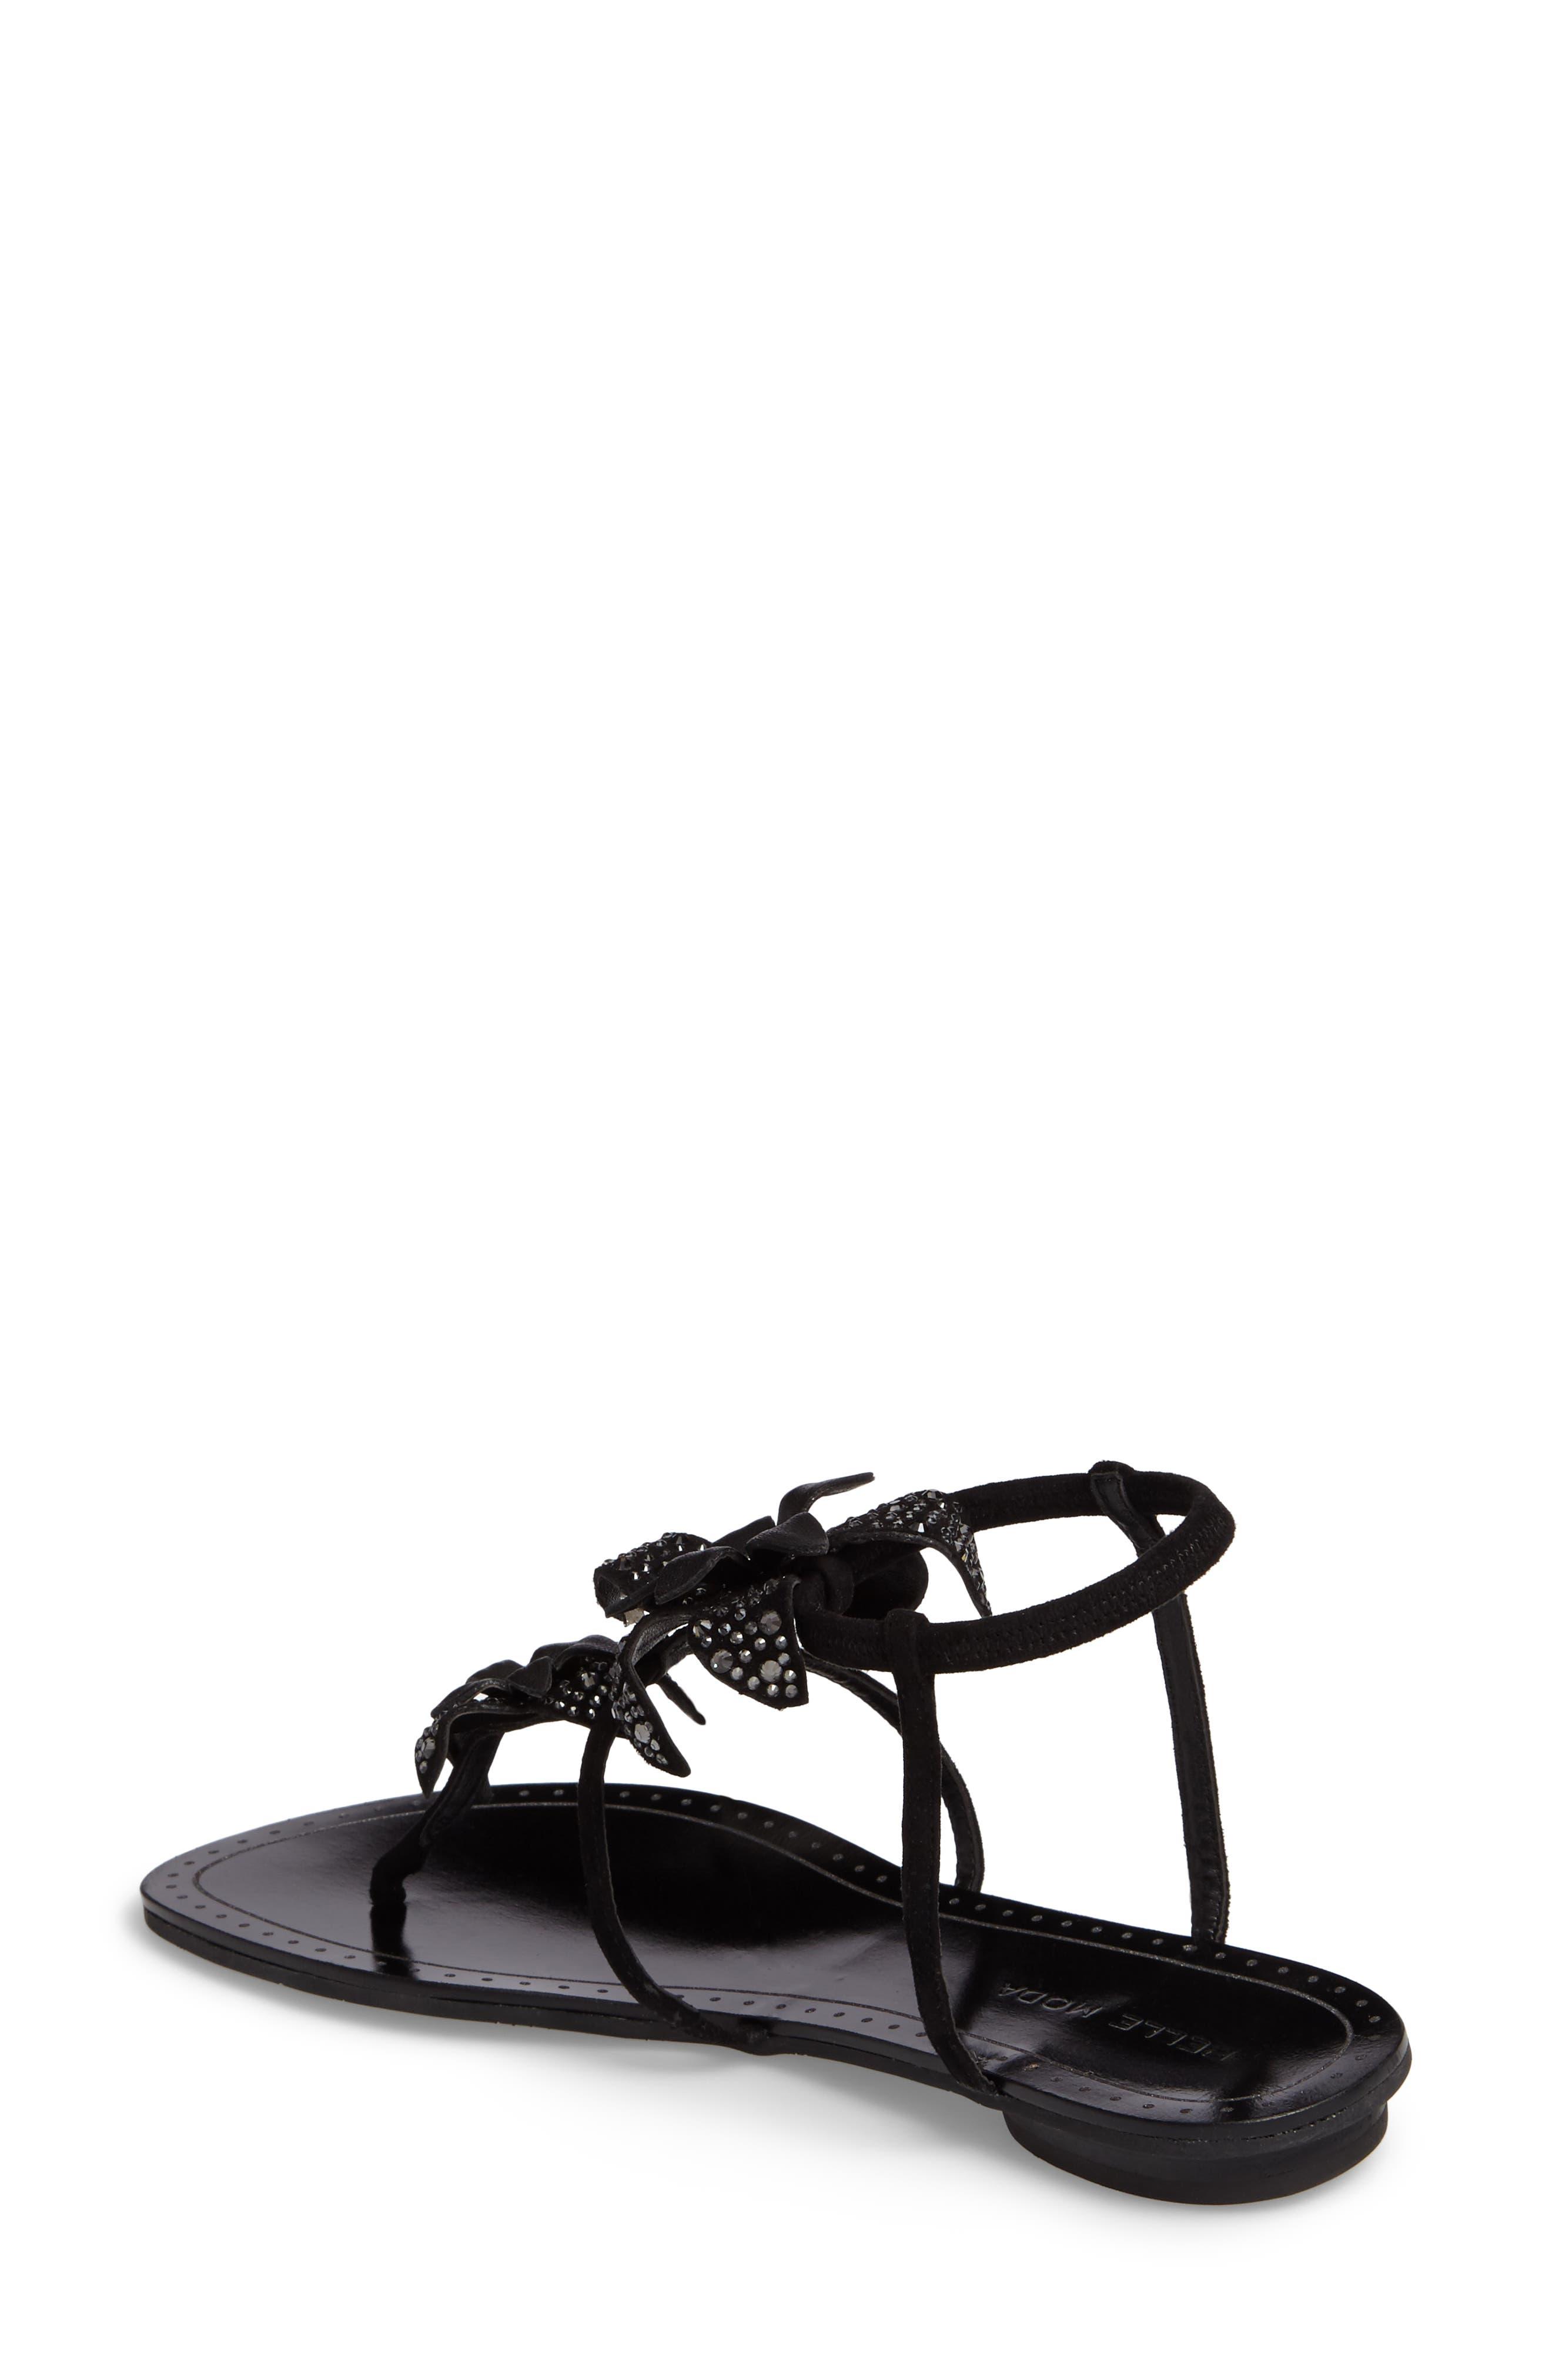 Ellis Strappy Flowered Sandal,                             Alternate thumbnail 2, color,                             Black Leather